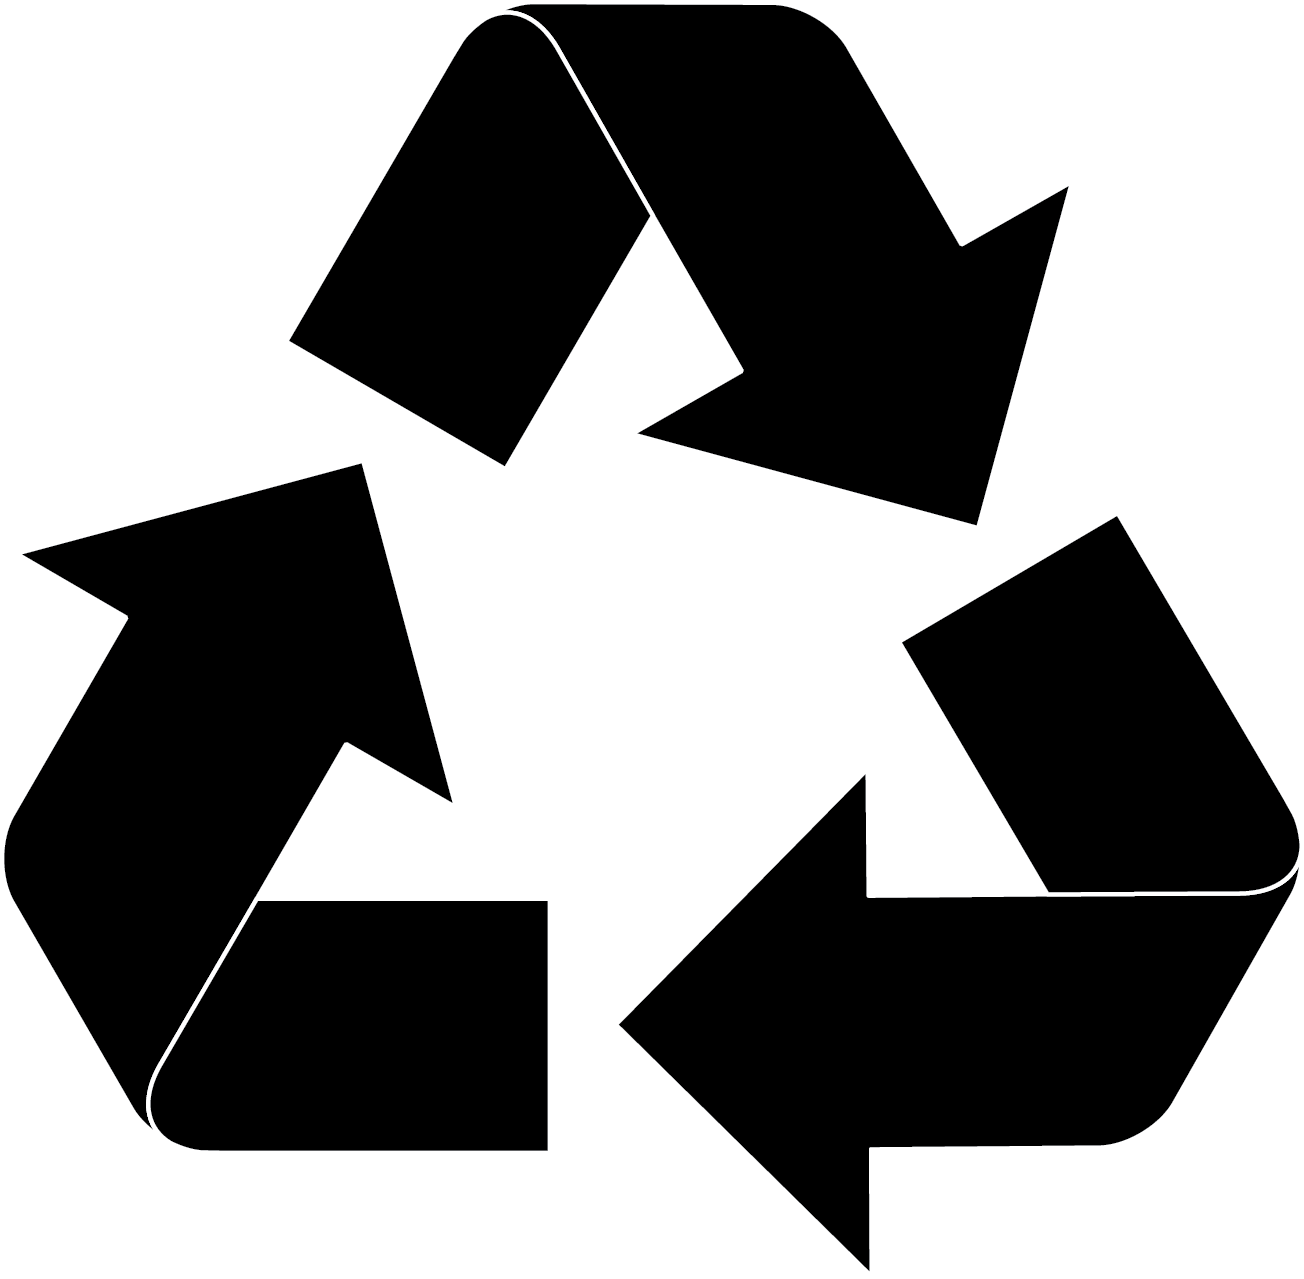 Recycle Symbol Transparent Png Stickpng